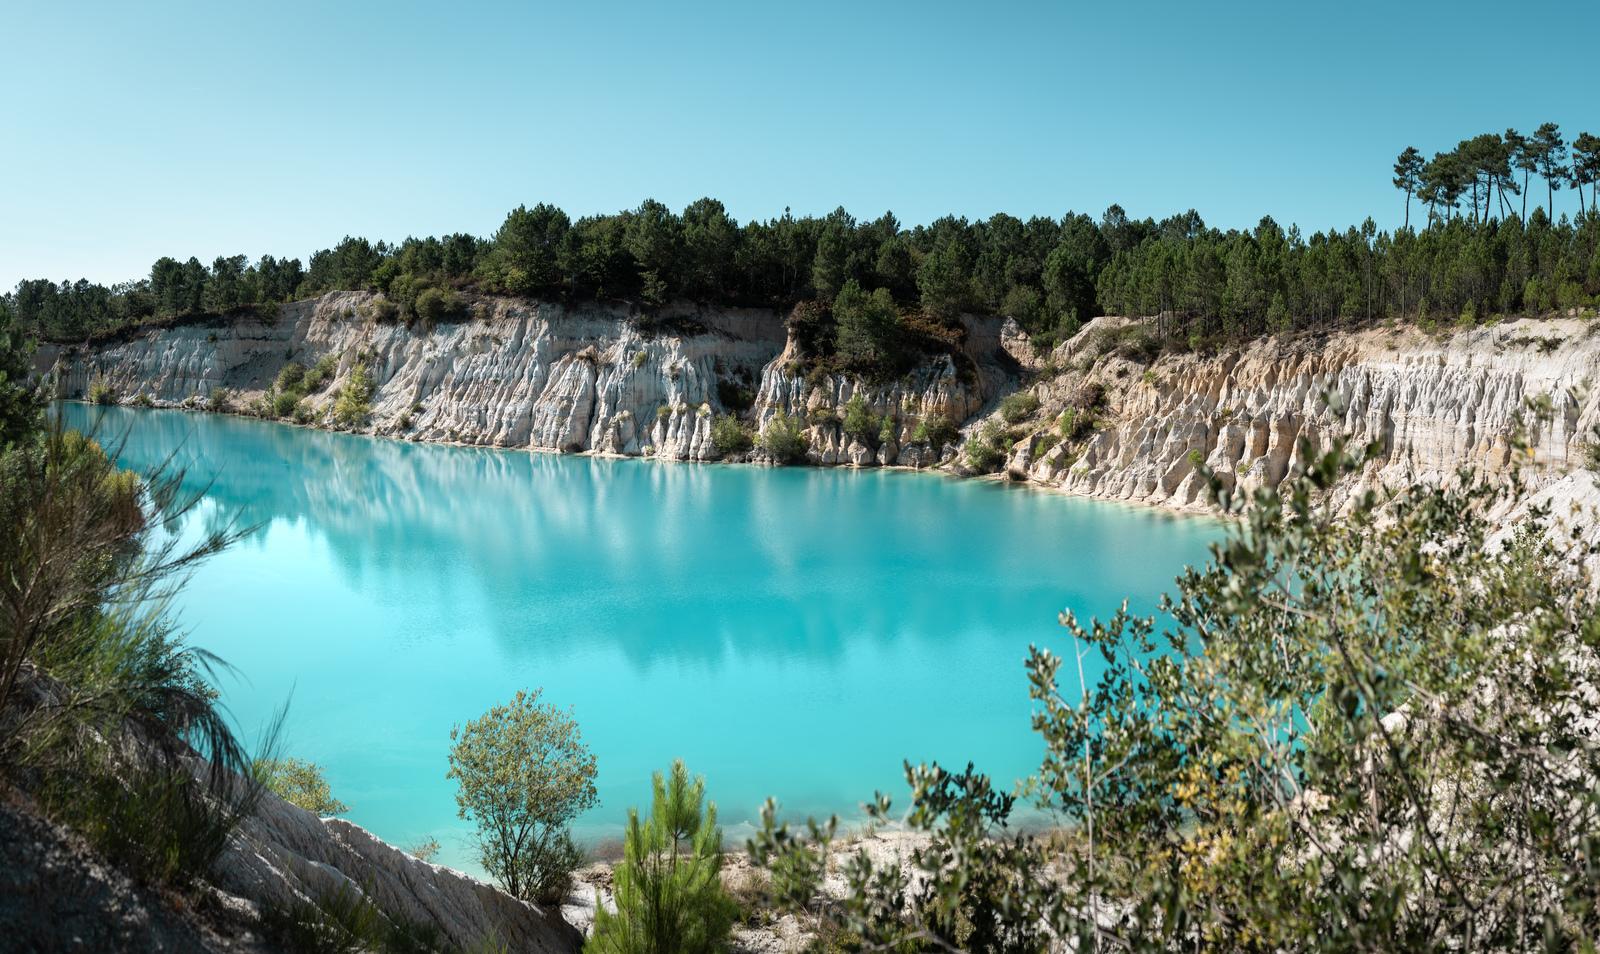 Le bleu du lac de Guizangeard Guizangeard